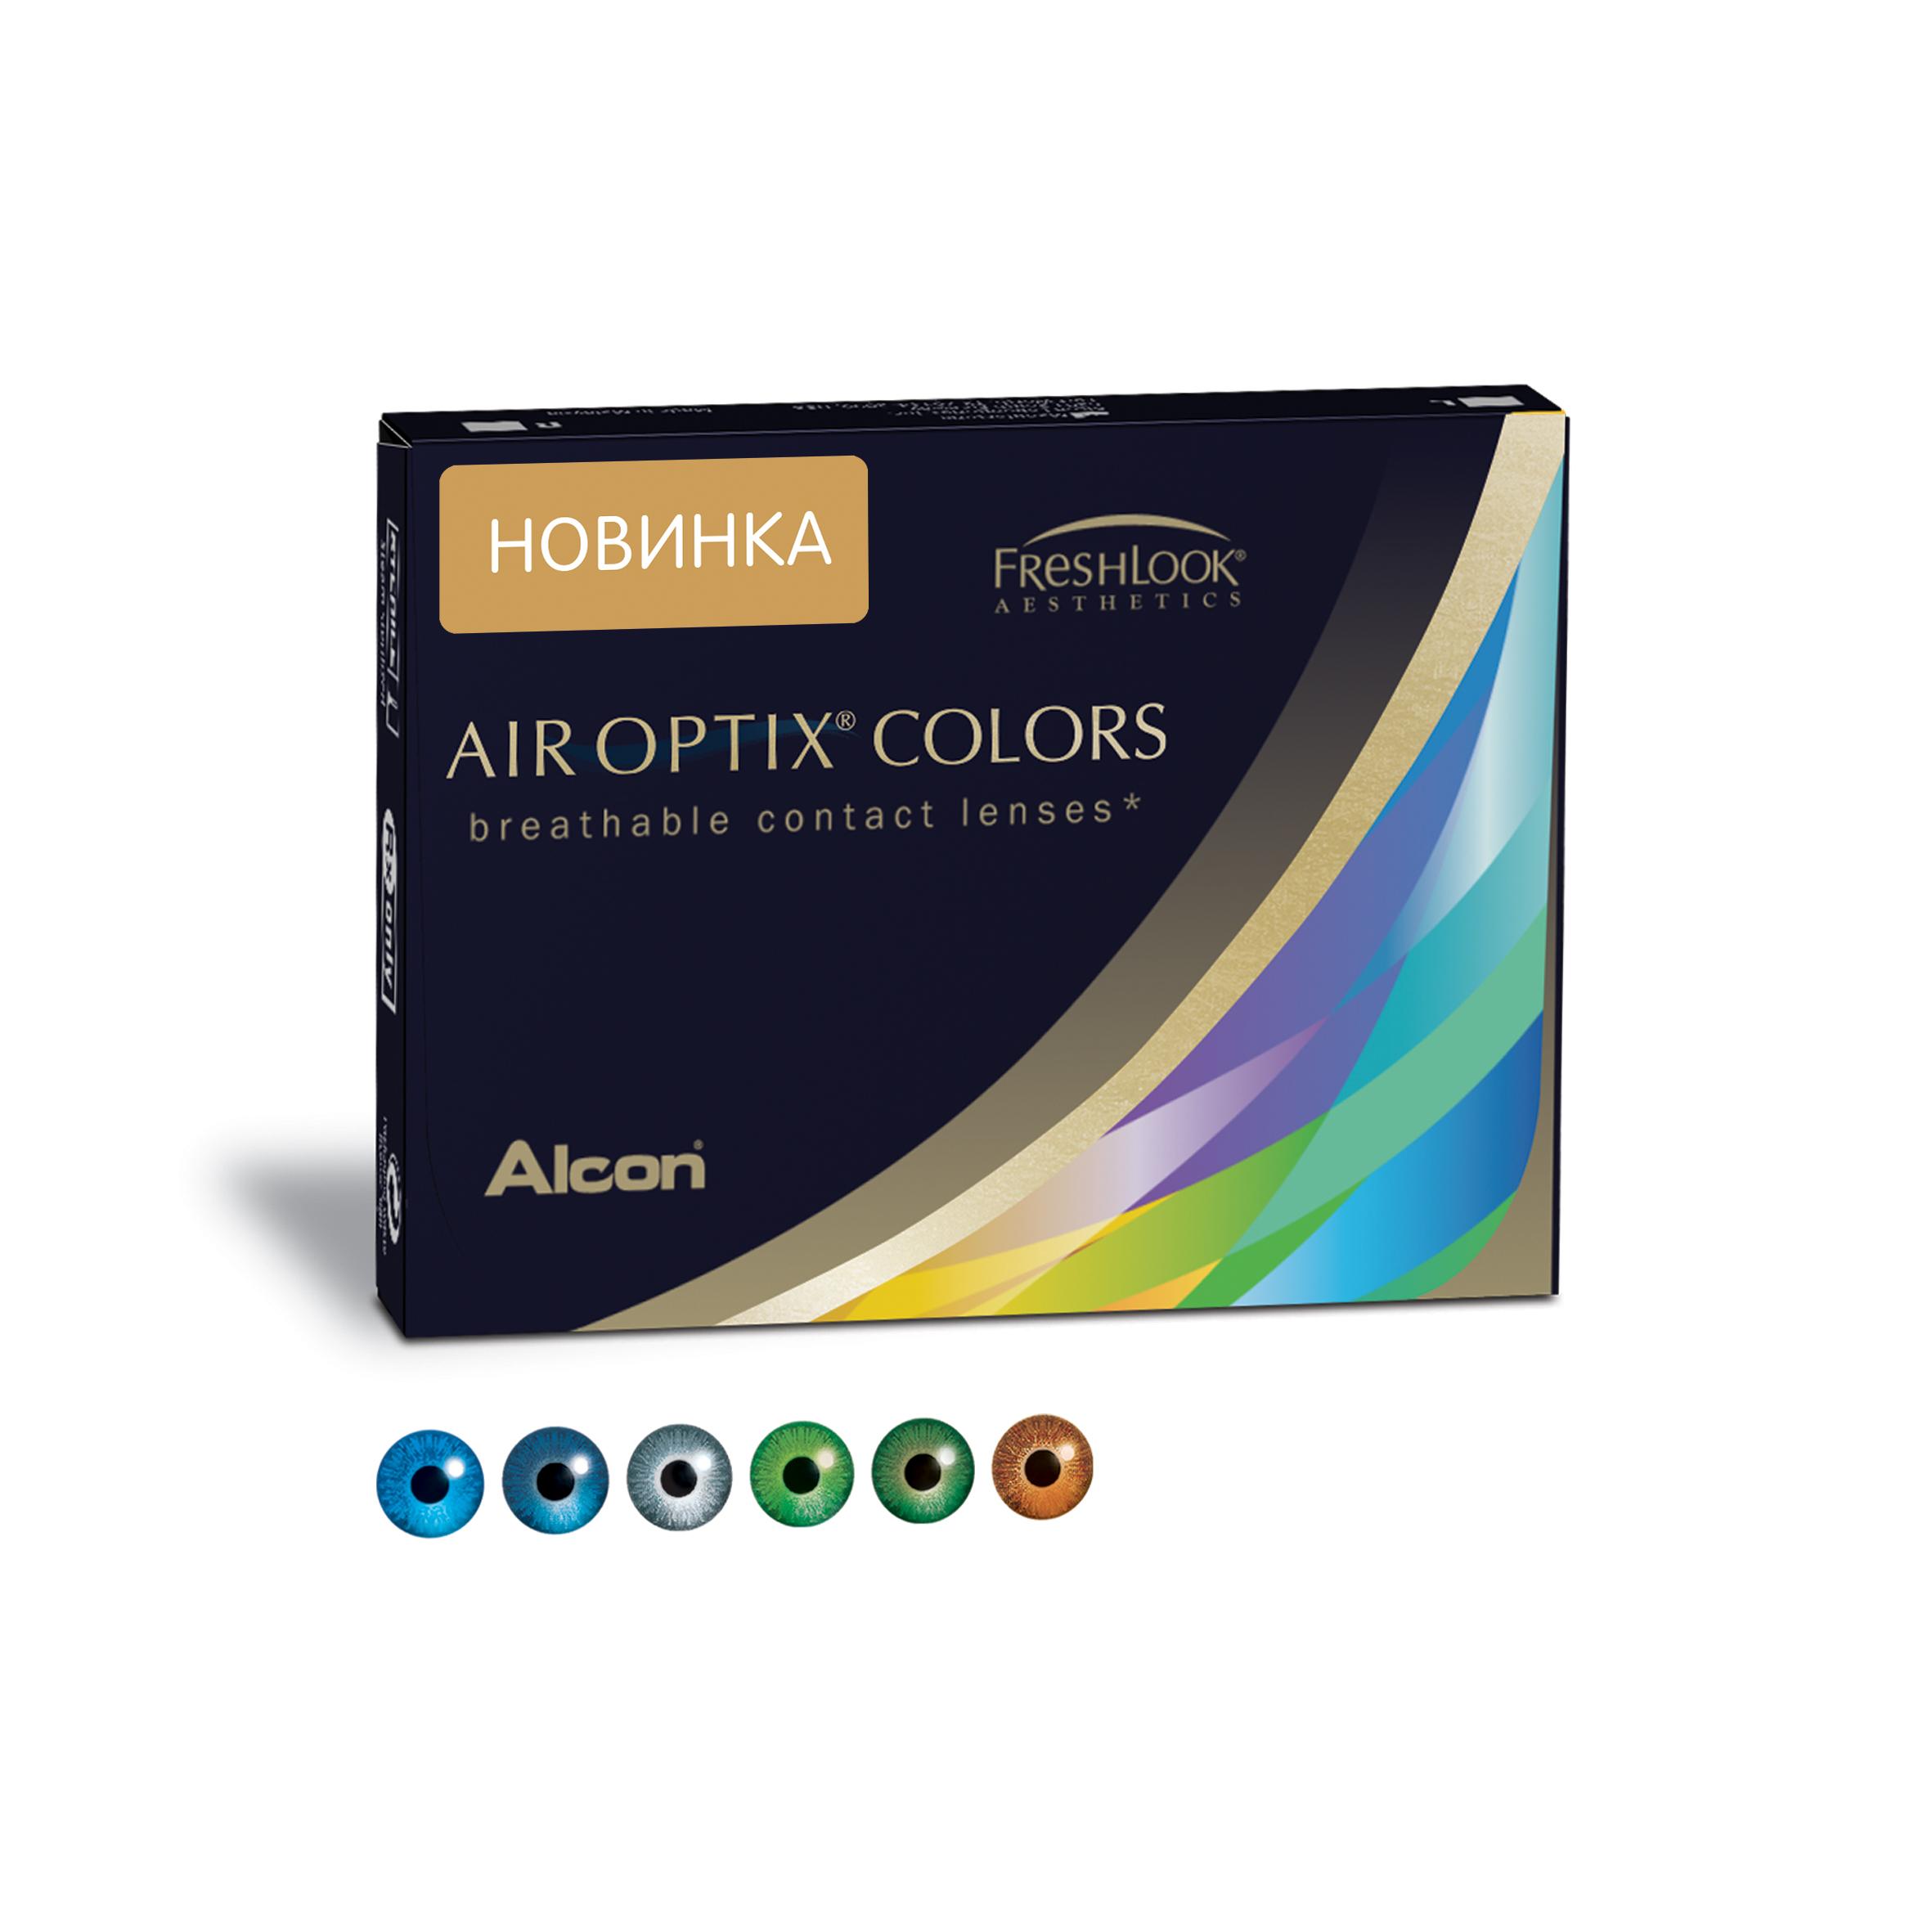 Аlcon контактные линзы Air Optix Colors 2 шт -1.00 Honey31746127Мягкие контактные линзы